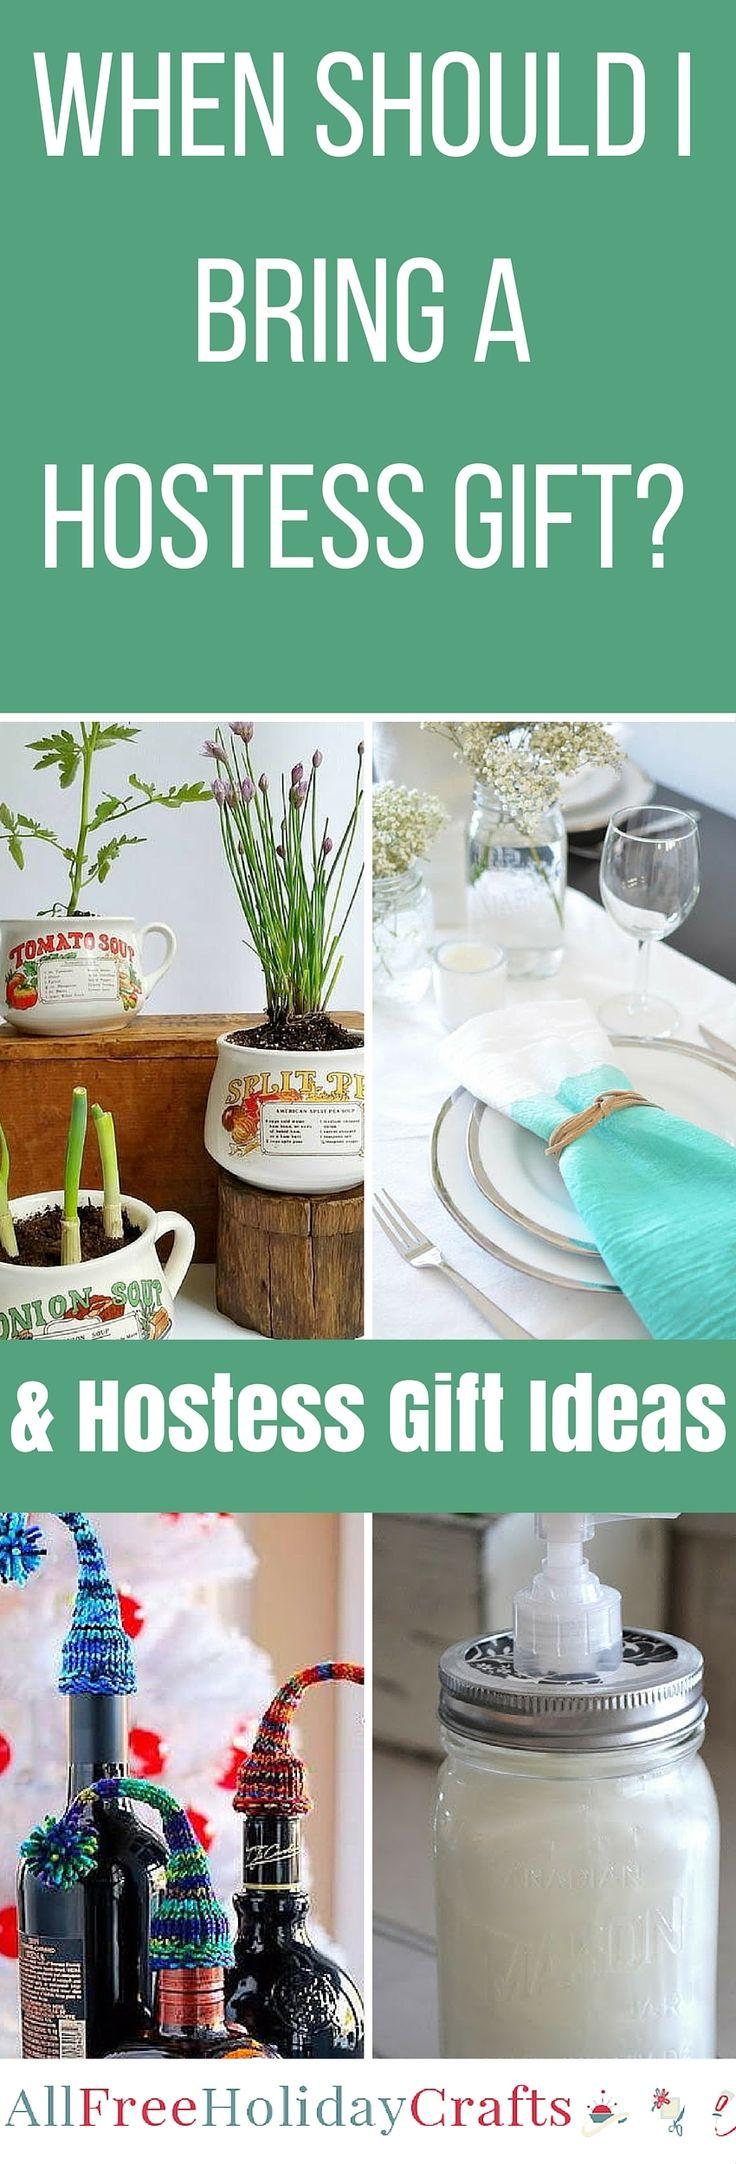 Wedding Shower Hostess Gift Etiquette : When Should I Bring a Hostess Gift? + 10 Best Hostess Gifts These ...